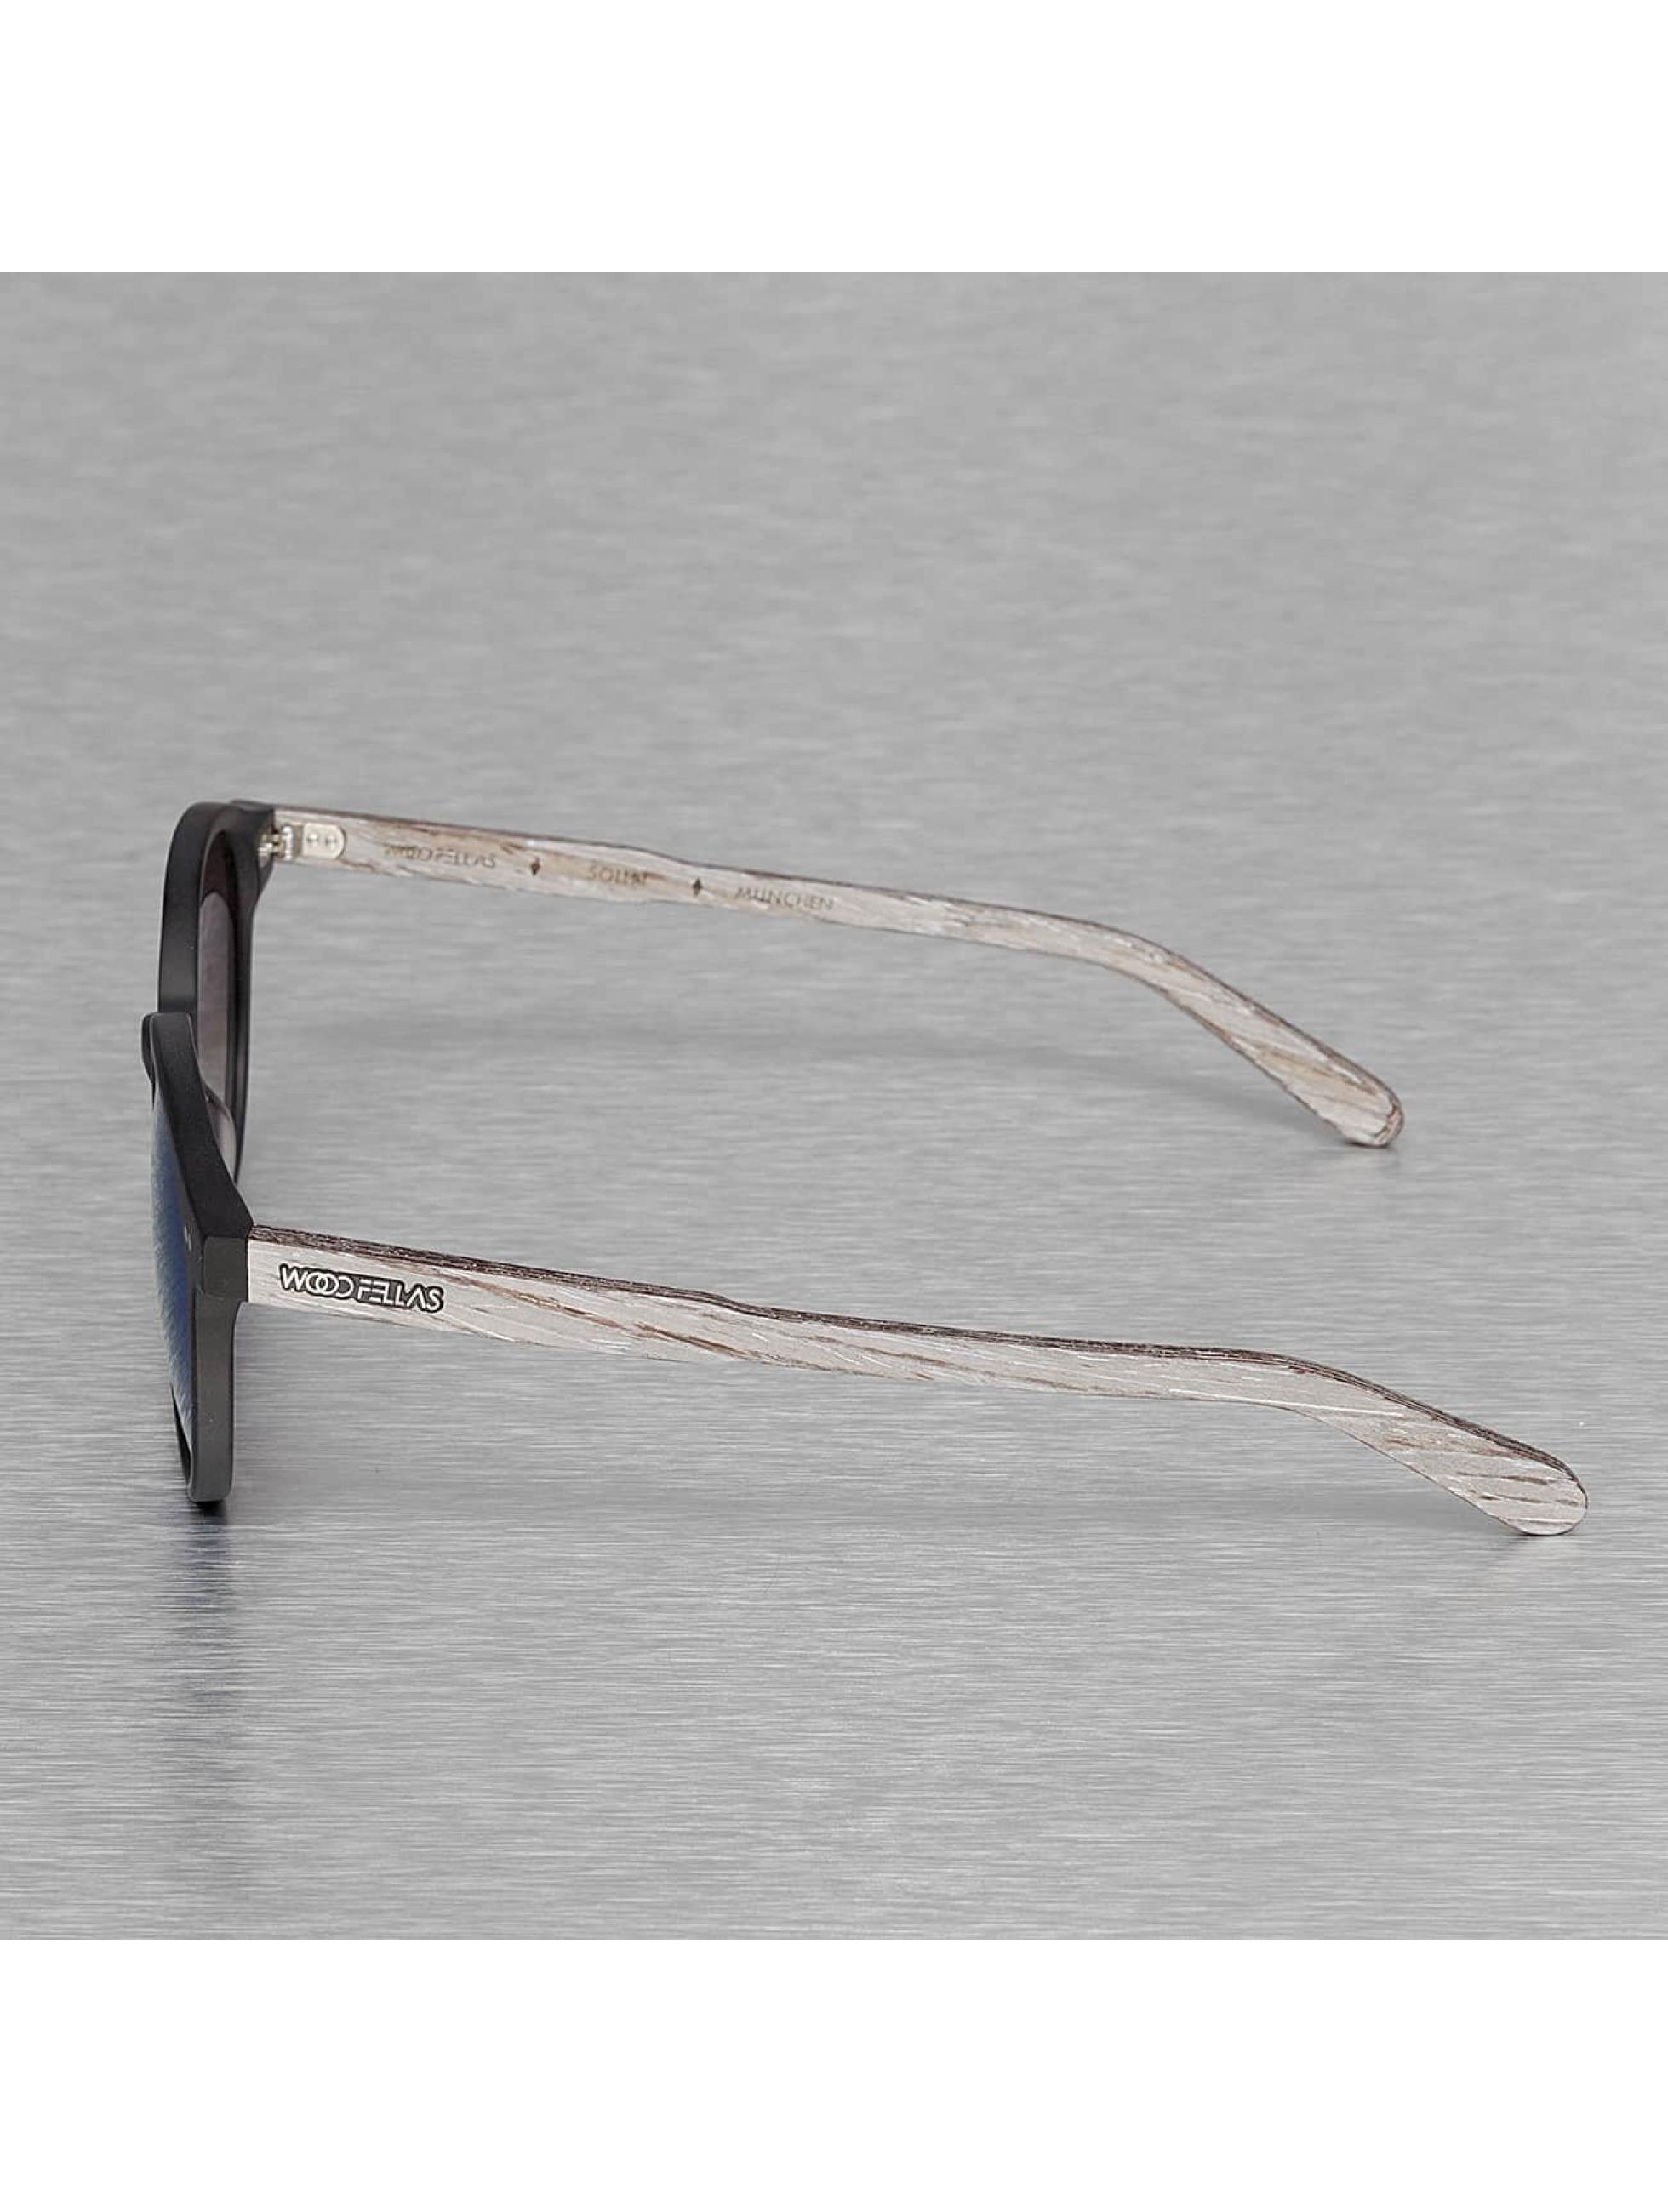 Wood Fellas Eyewear Sunglasses Eyewear Solln Polarized Mirror black